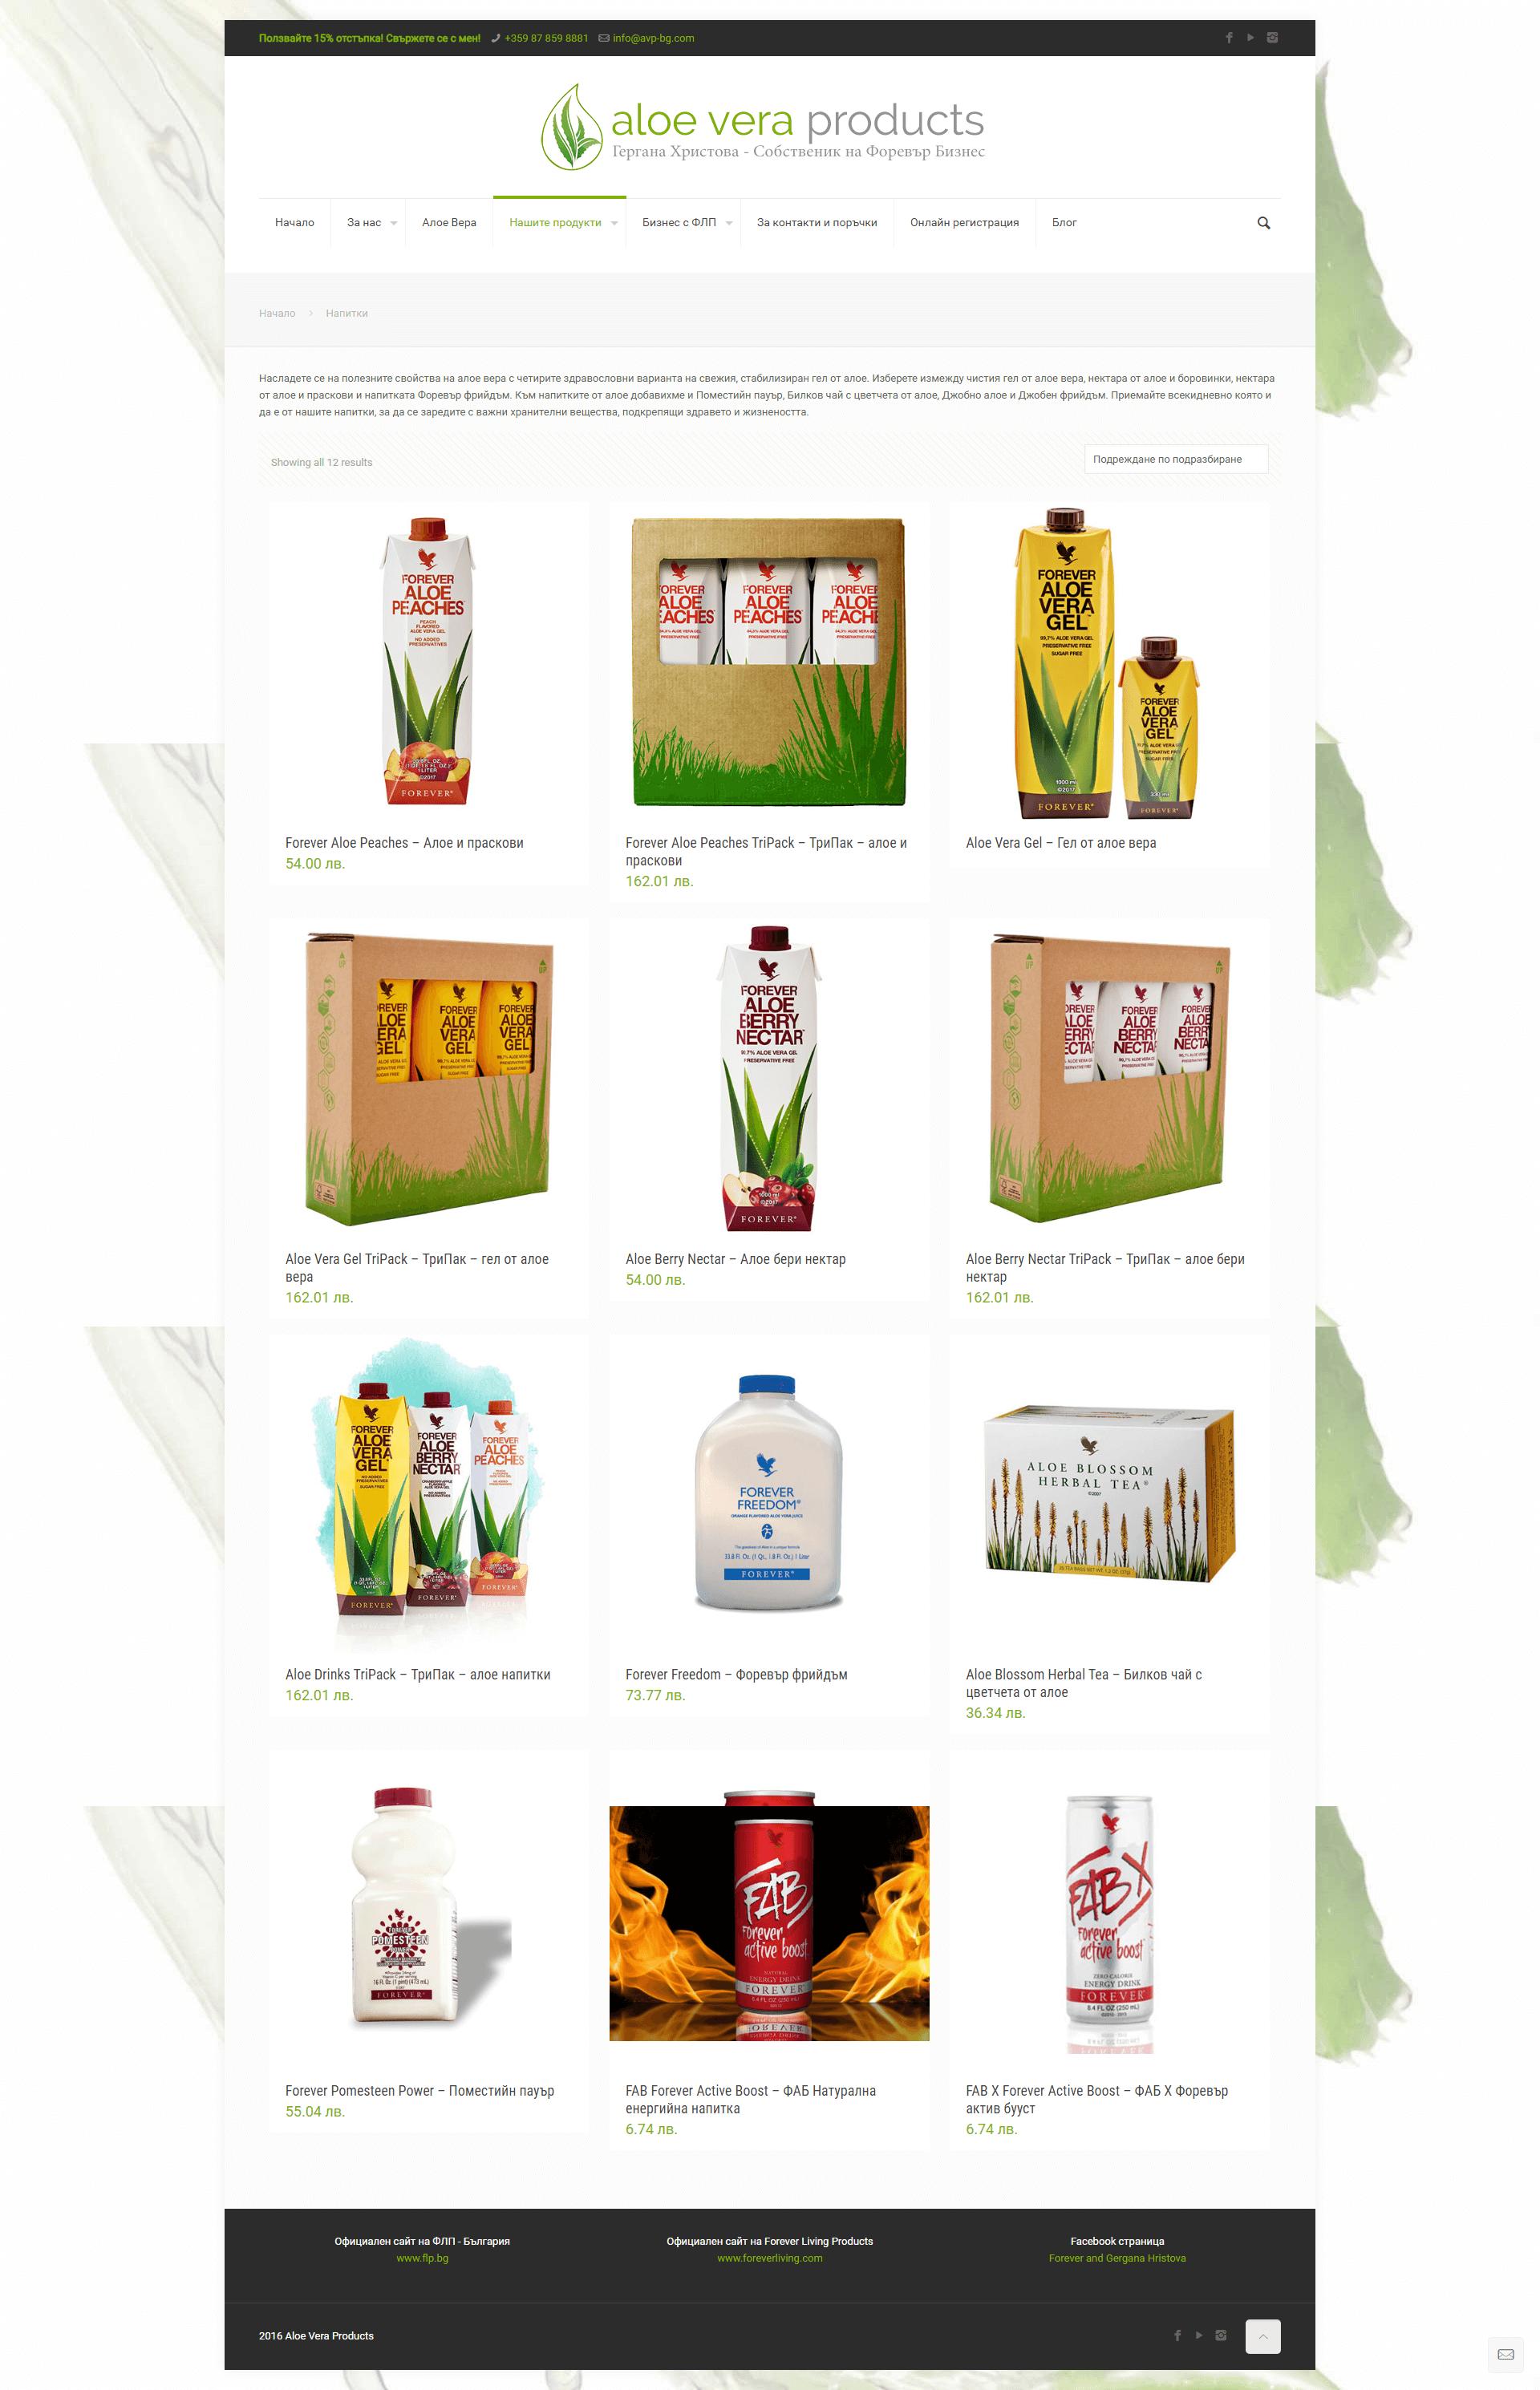 screenshot-product-category-drinks-avp-bg